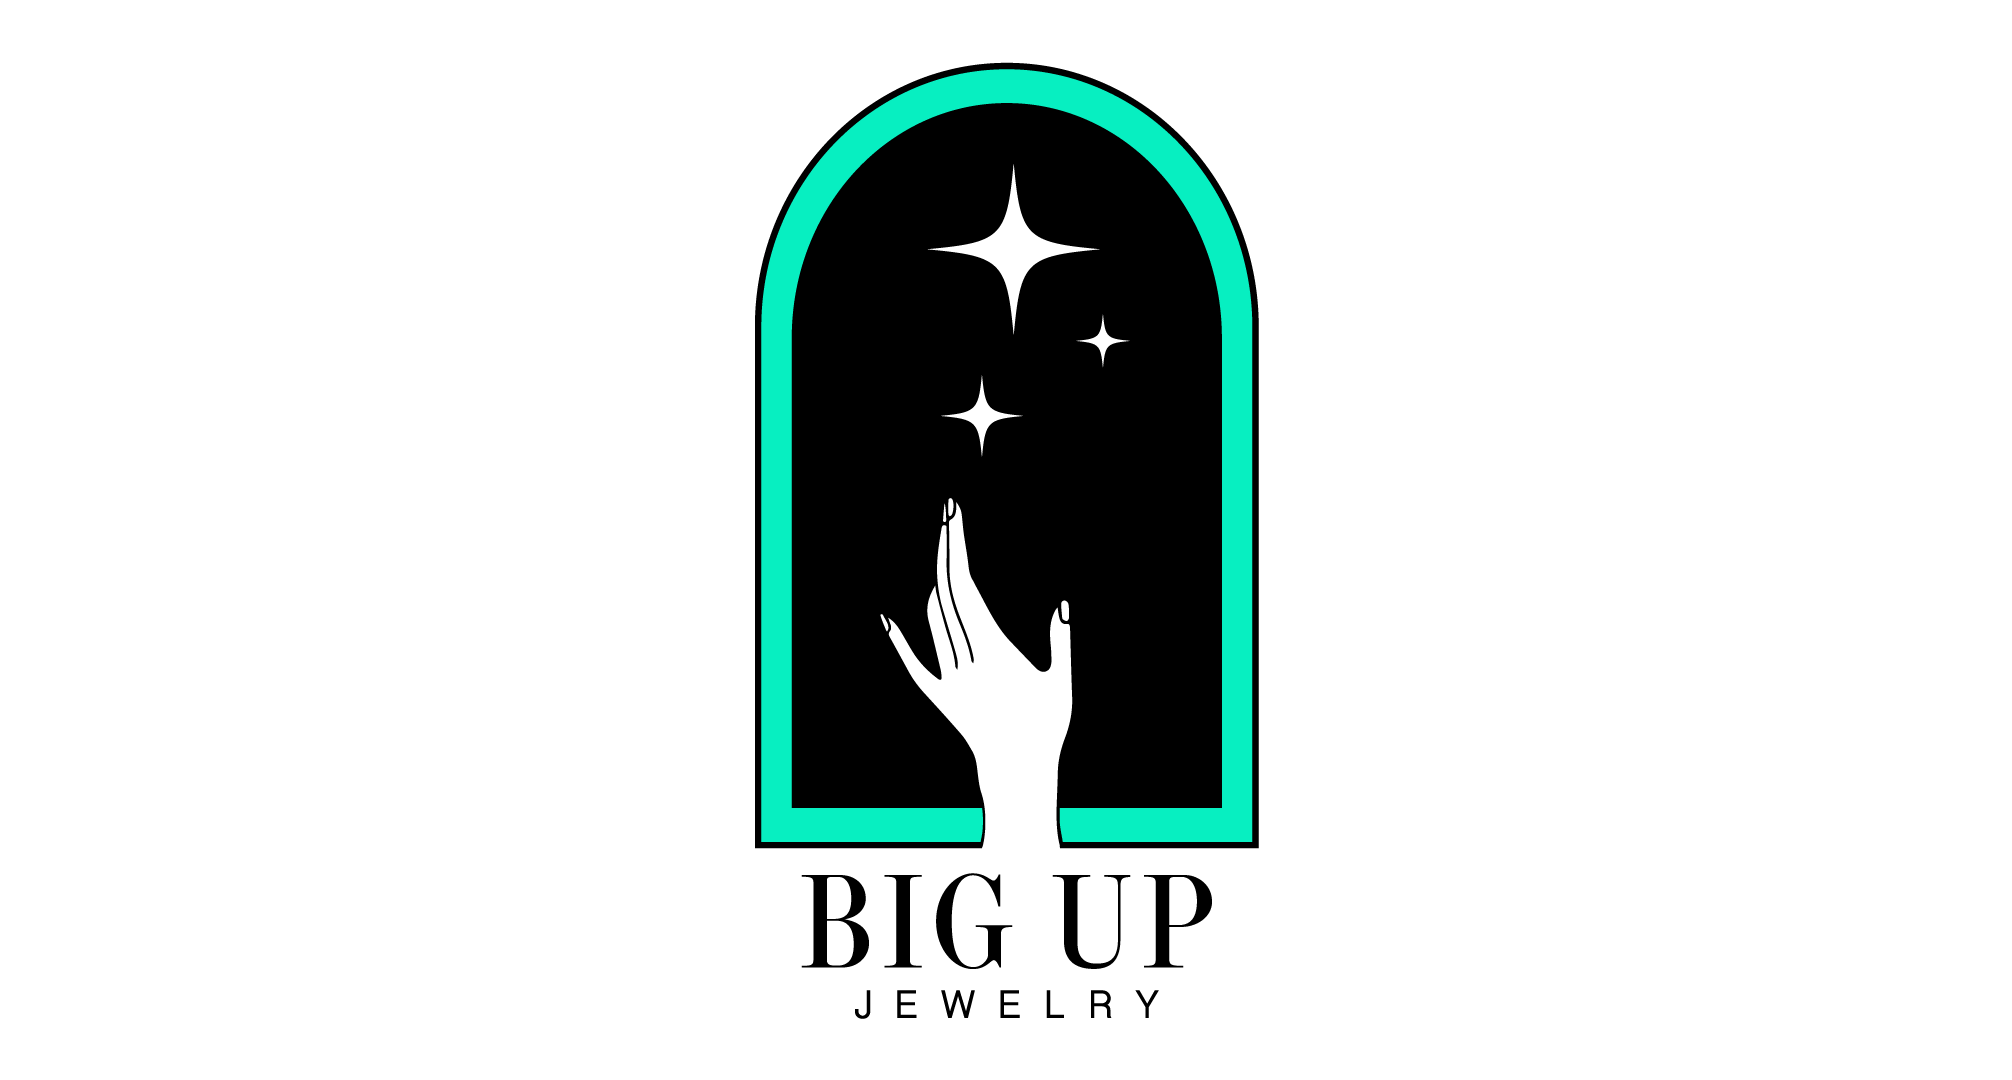 BigUpJewelry_Teal